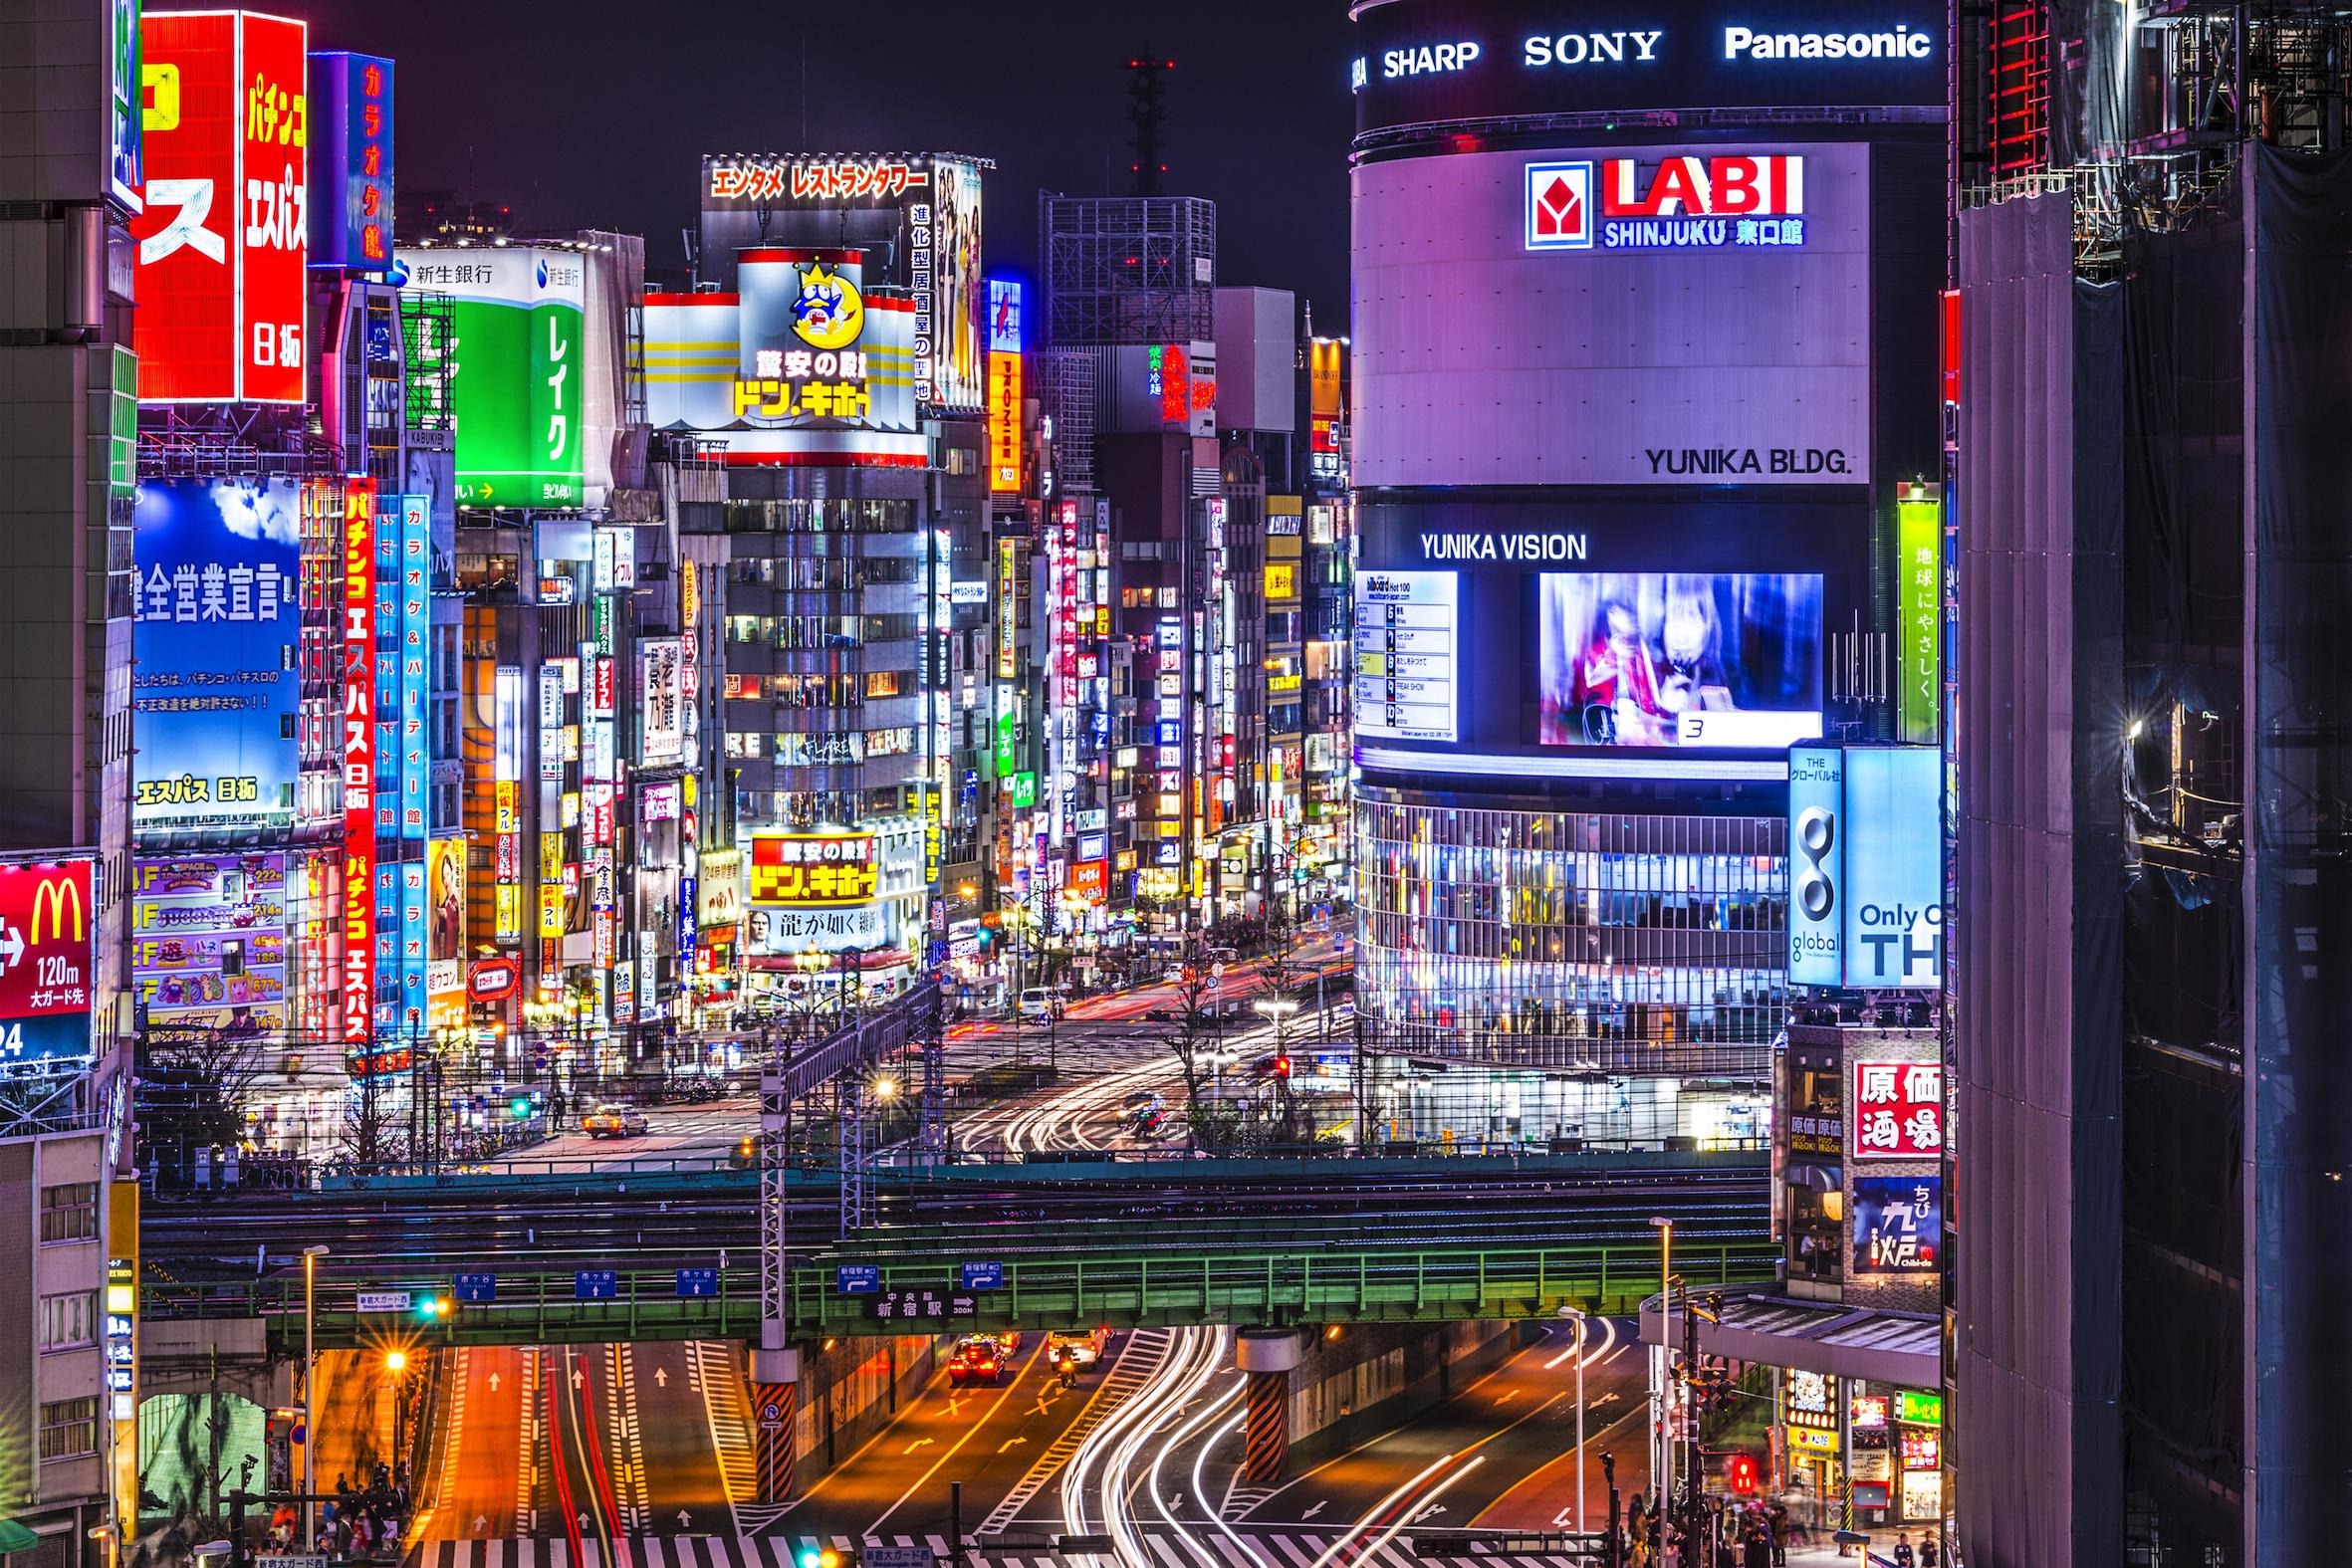 One day in... Shinjuku